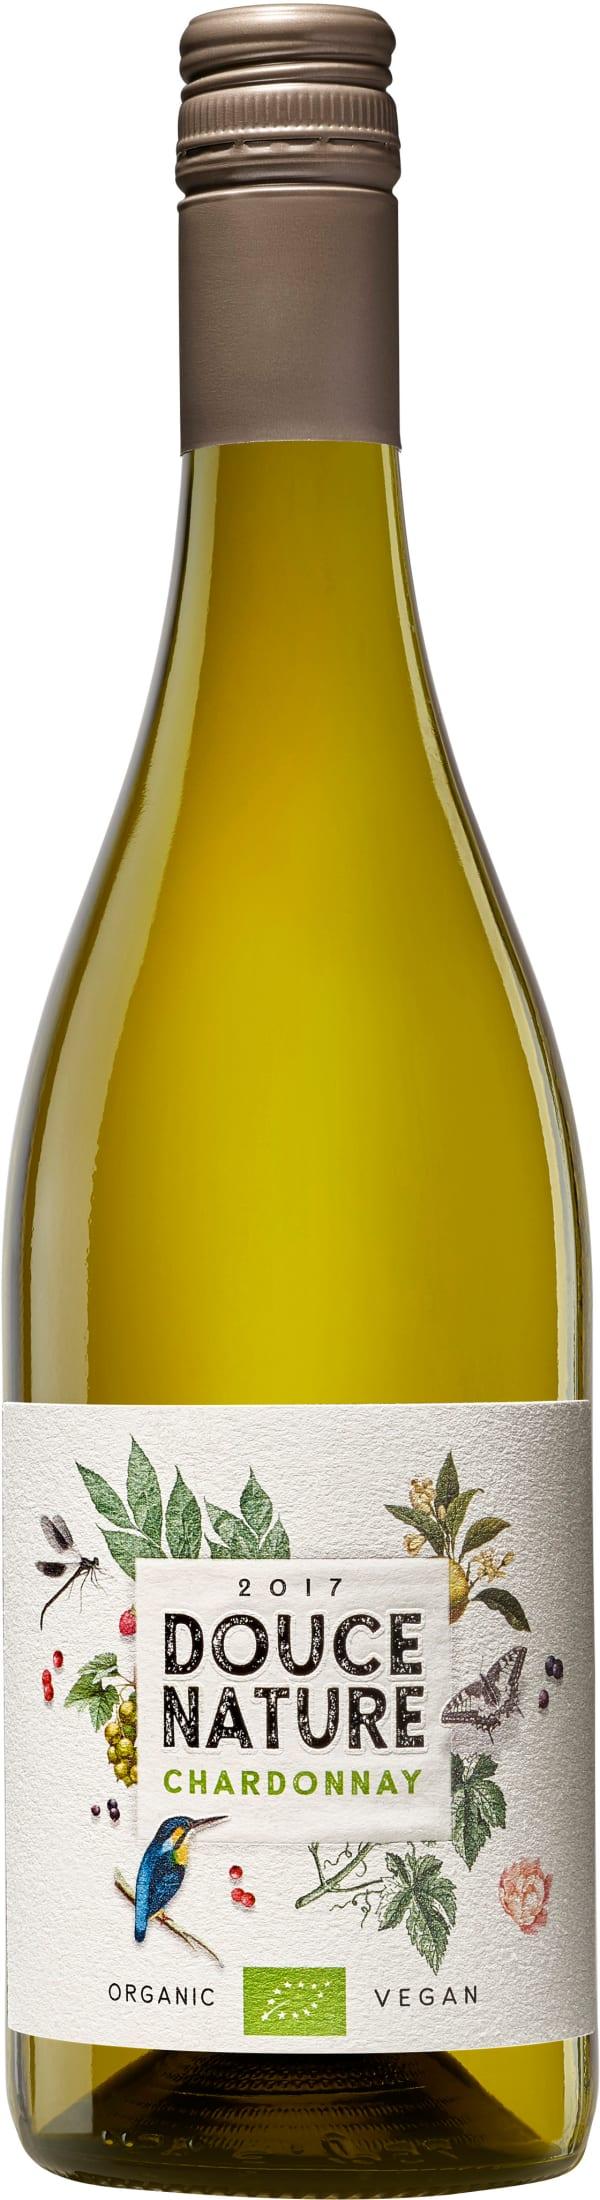 Douce Nature Organic Chardonnay 2018